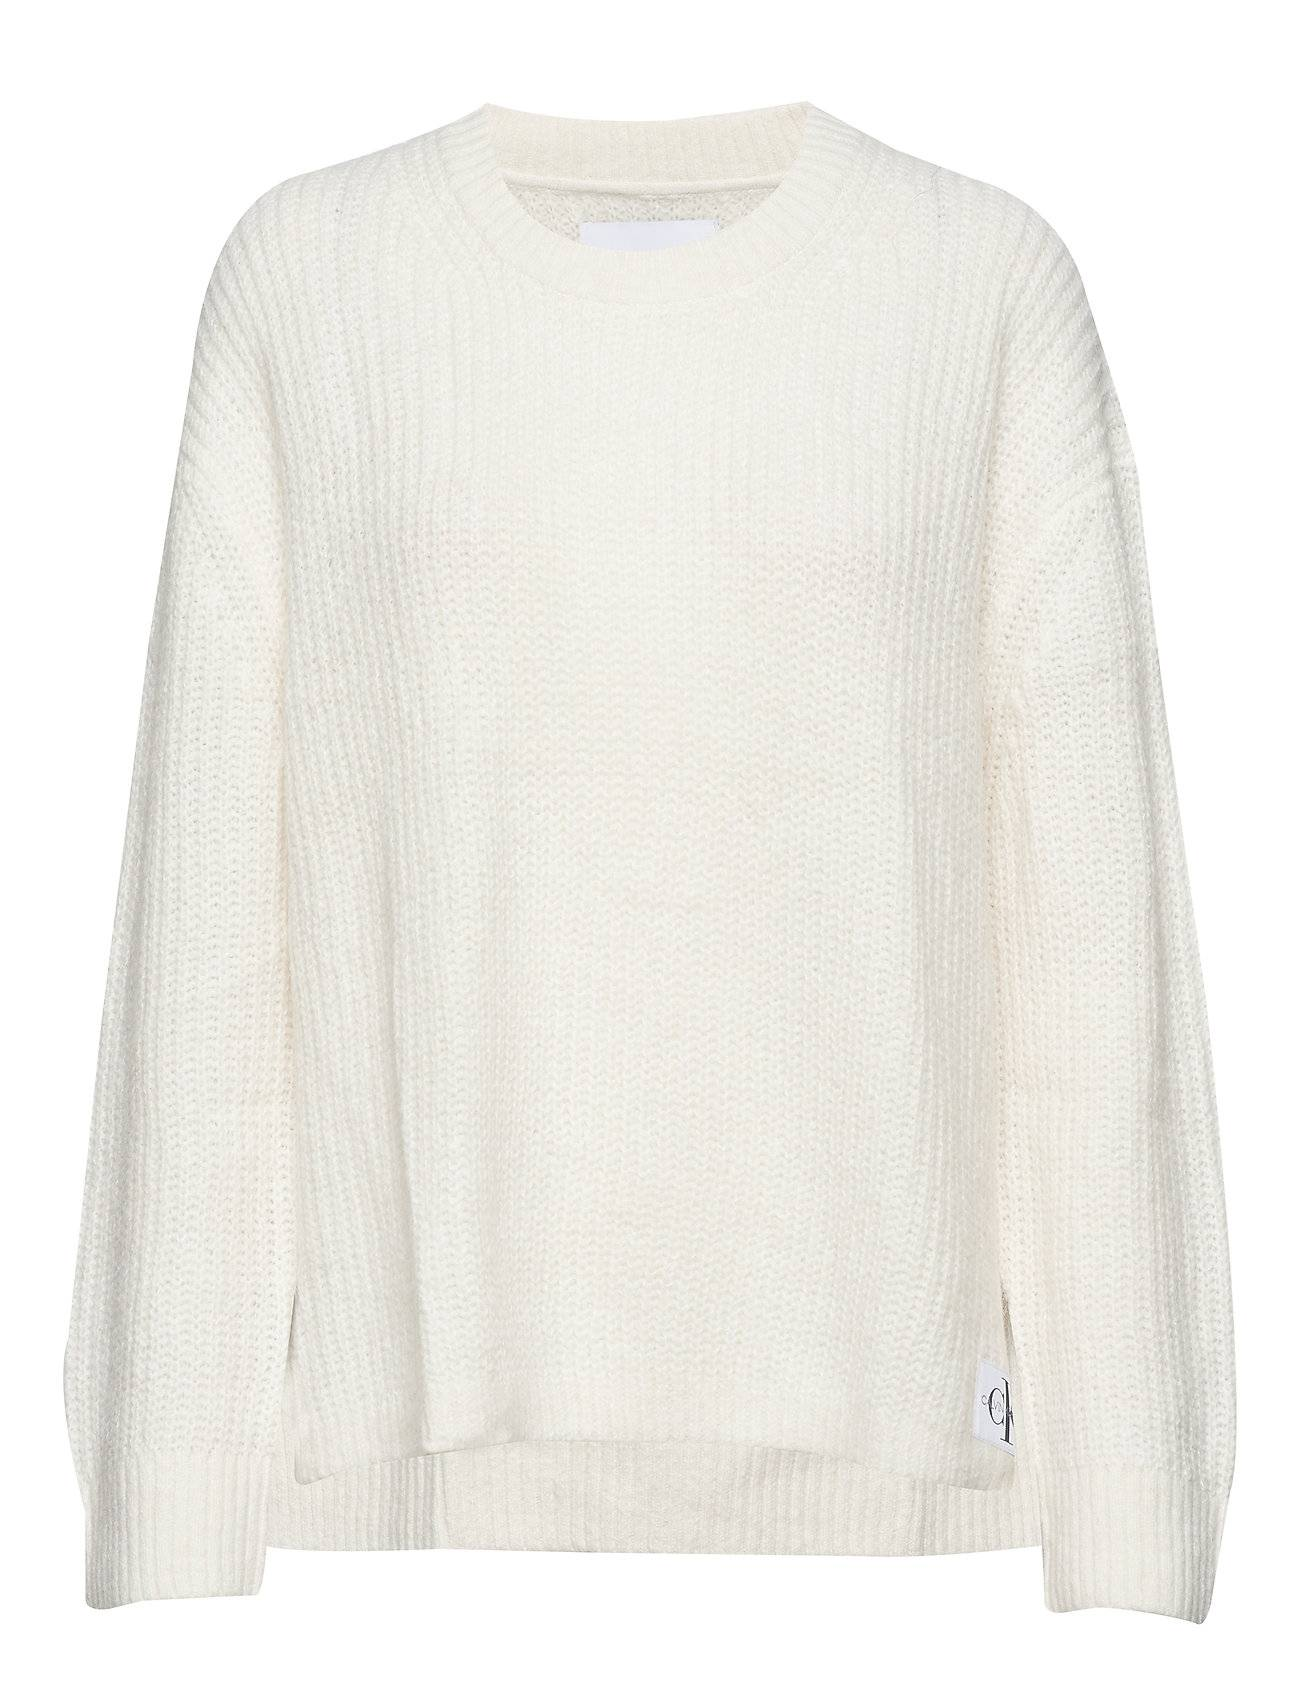 Image of Calvin Wool Blend Cn Sweater Neulepaita Valkoinen Calvin Klein Jeans